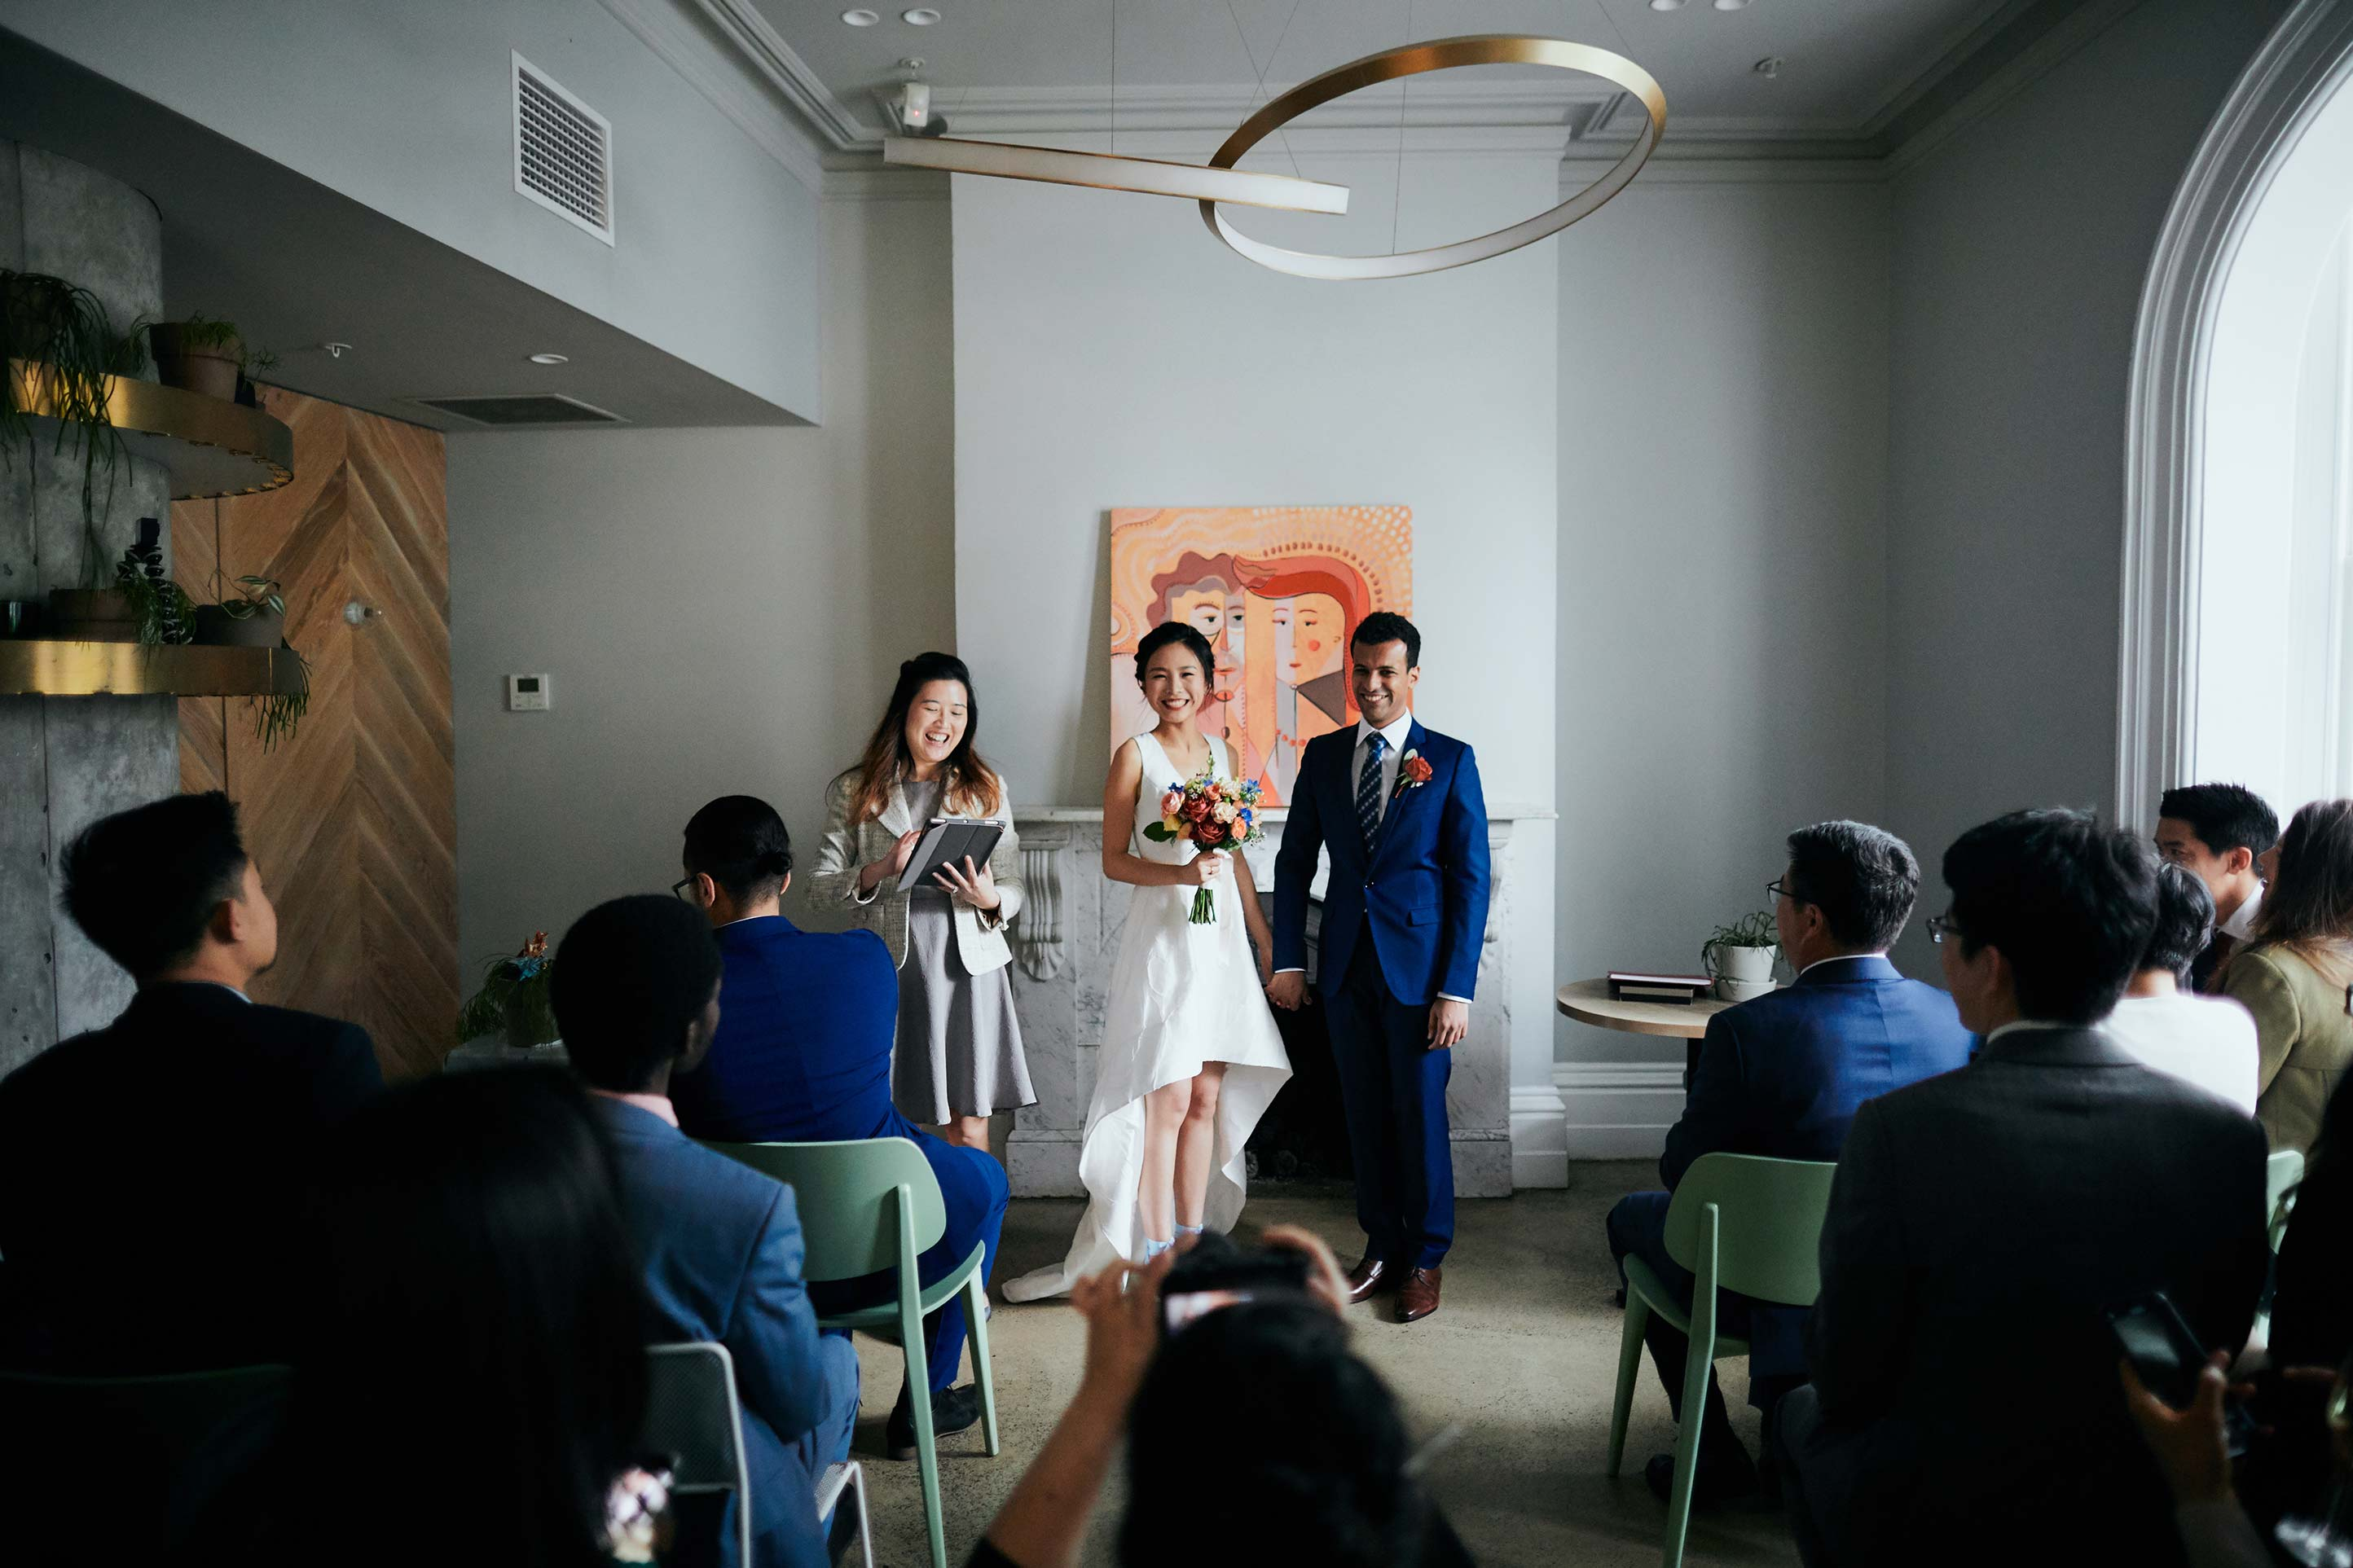 Melbourne-Wedding-Photographer-Kettle-Black-ceremony